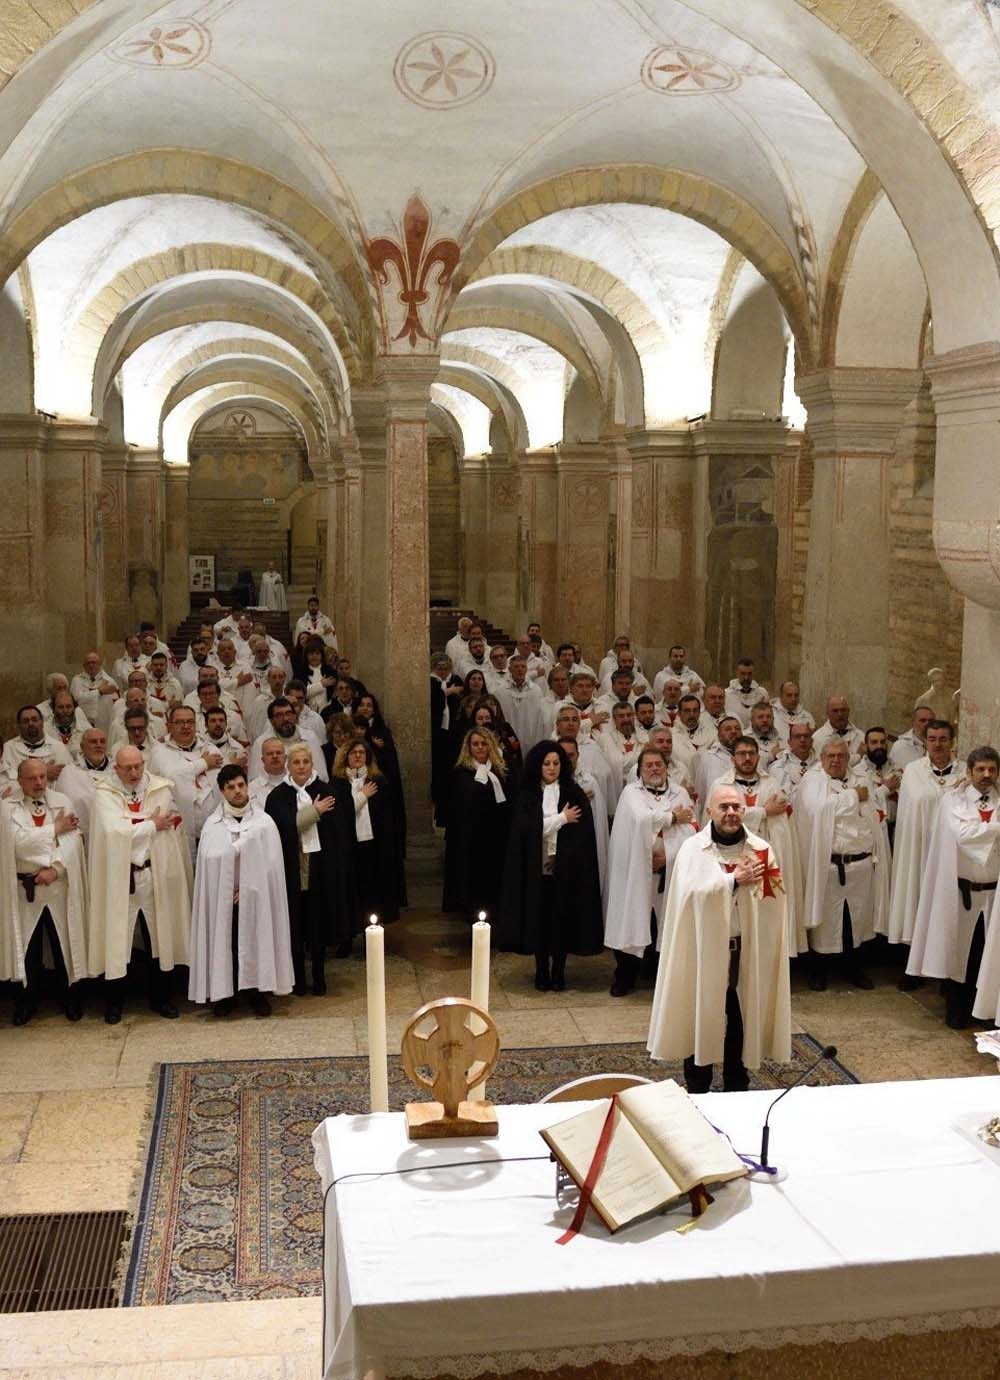 Tours - Following the Templars in Verona (photo 2)